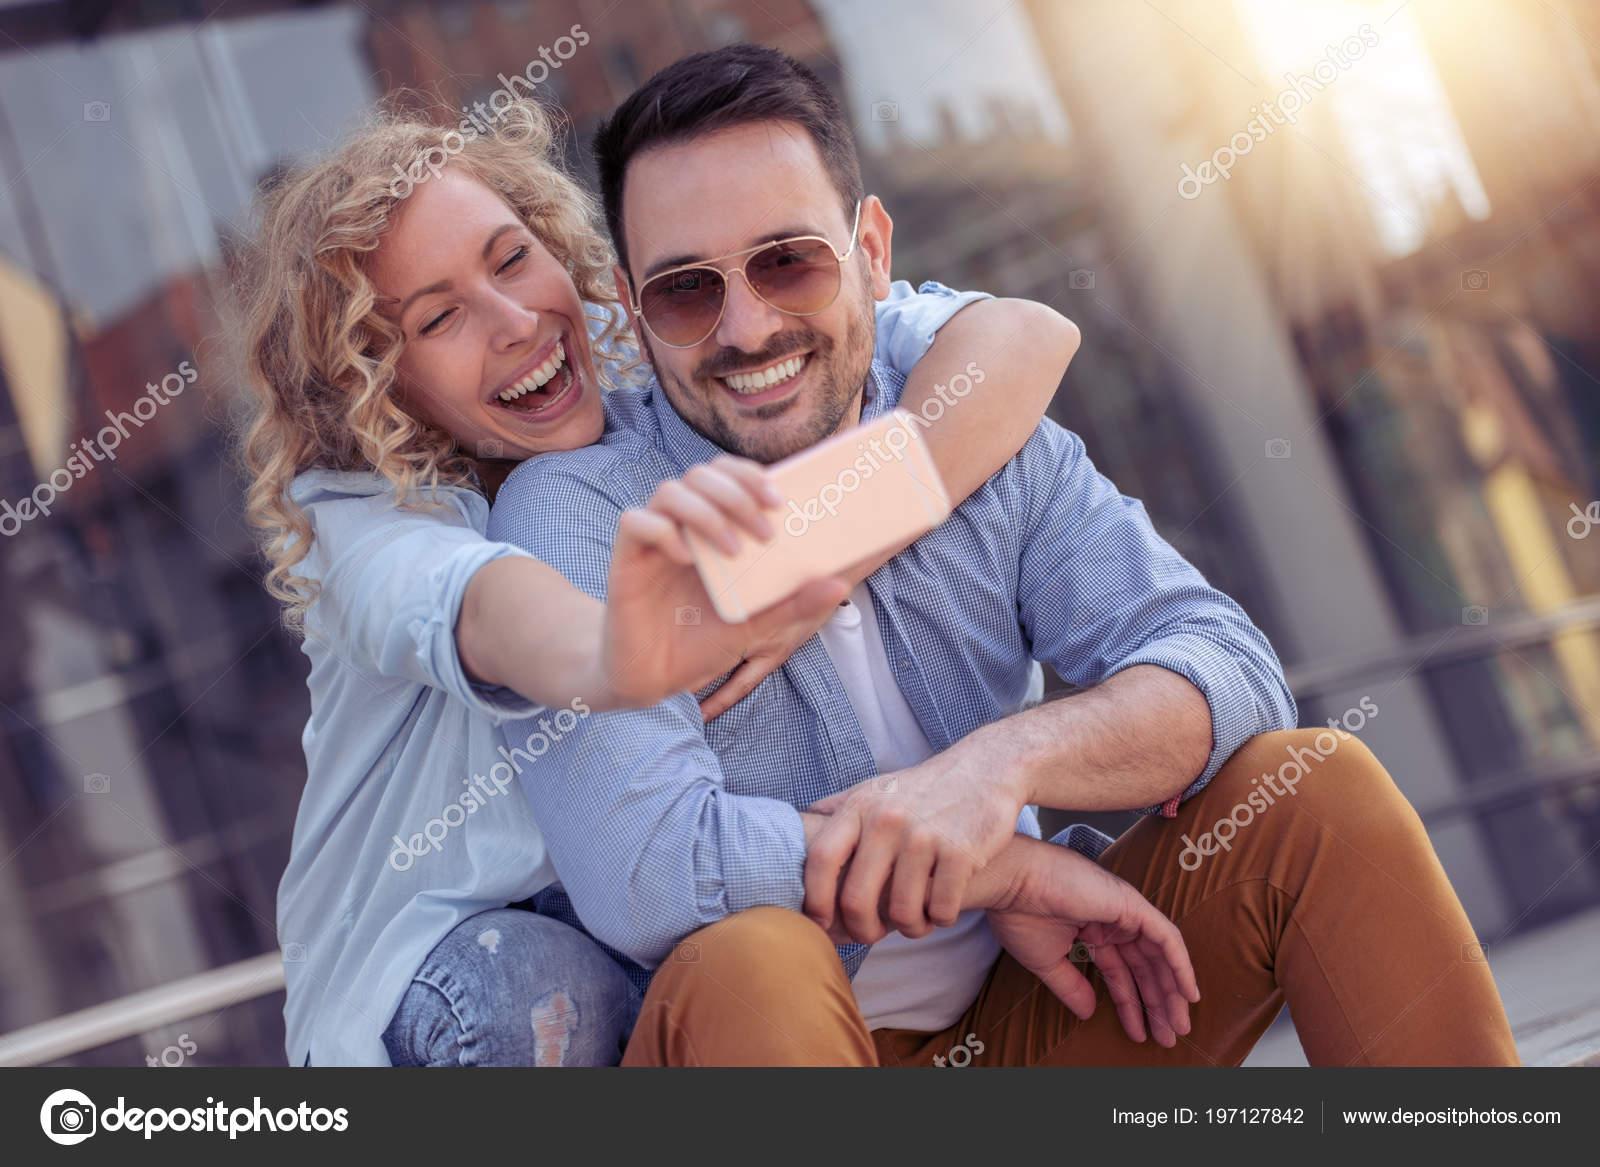 Секс развлечение пар фото